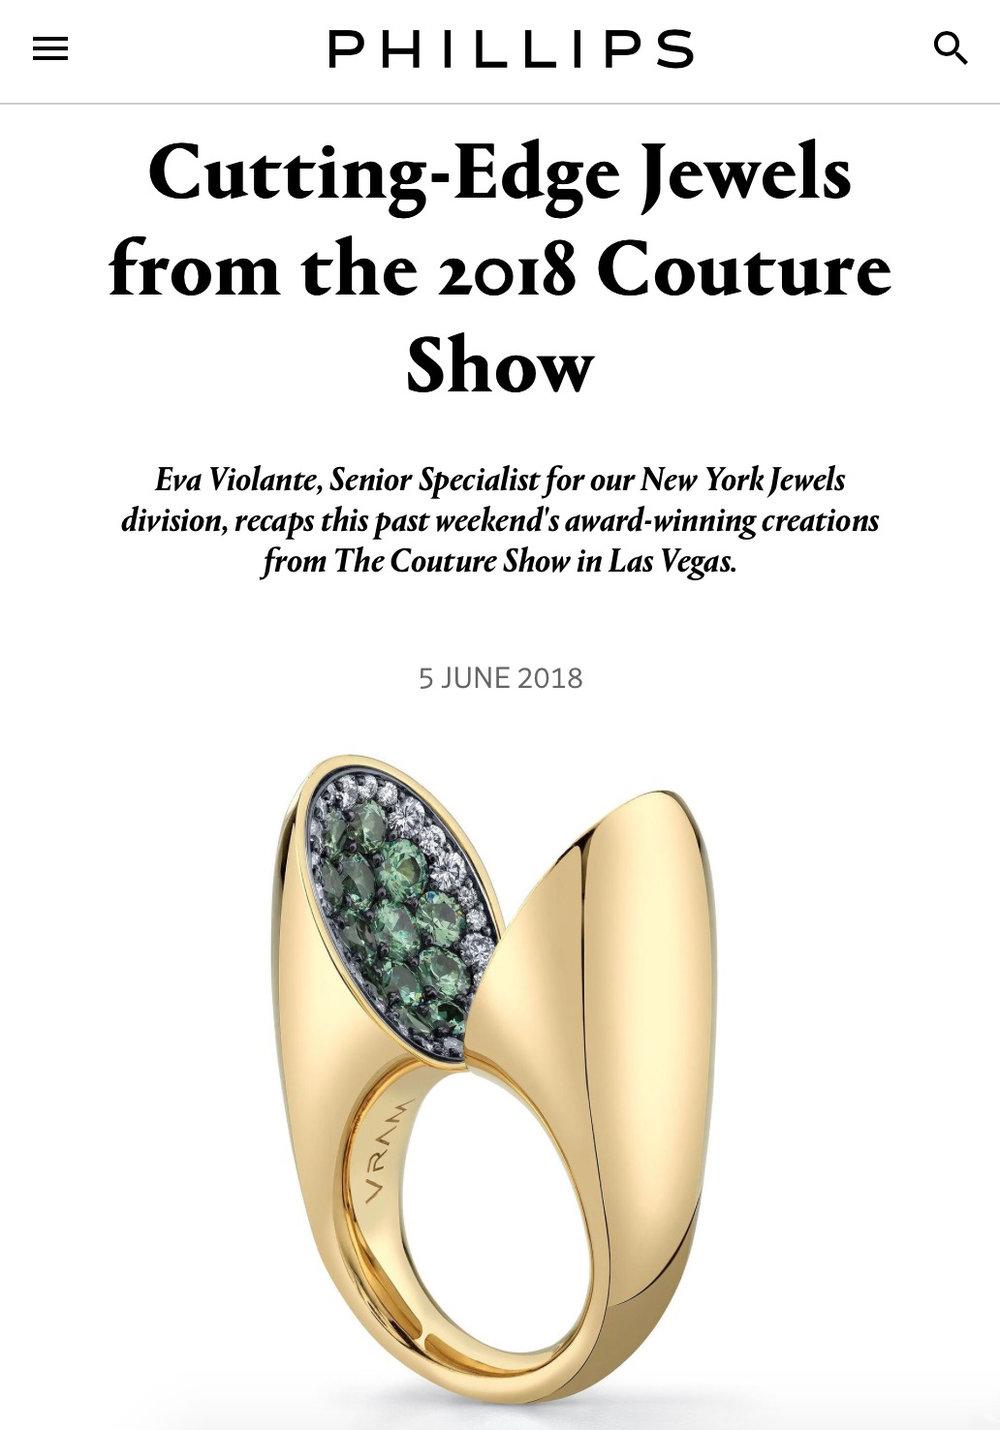 VRAM Jewelry Phillips Couture Award 2018 Cutting Edge